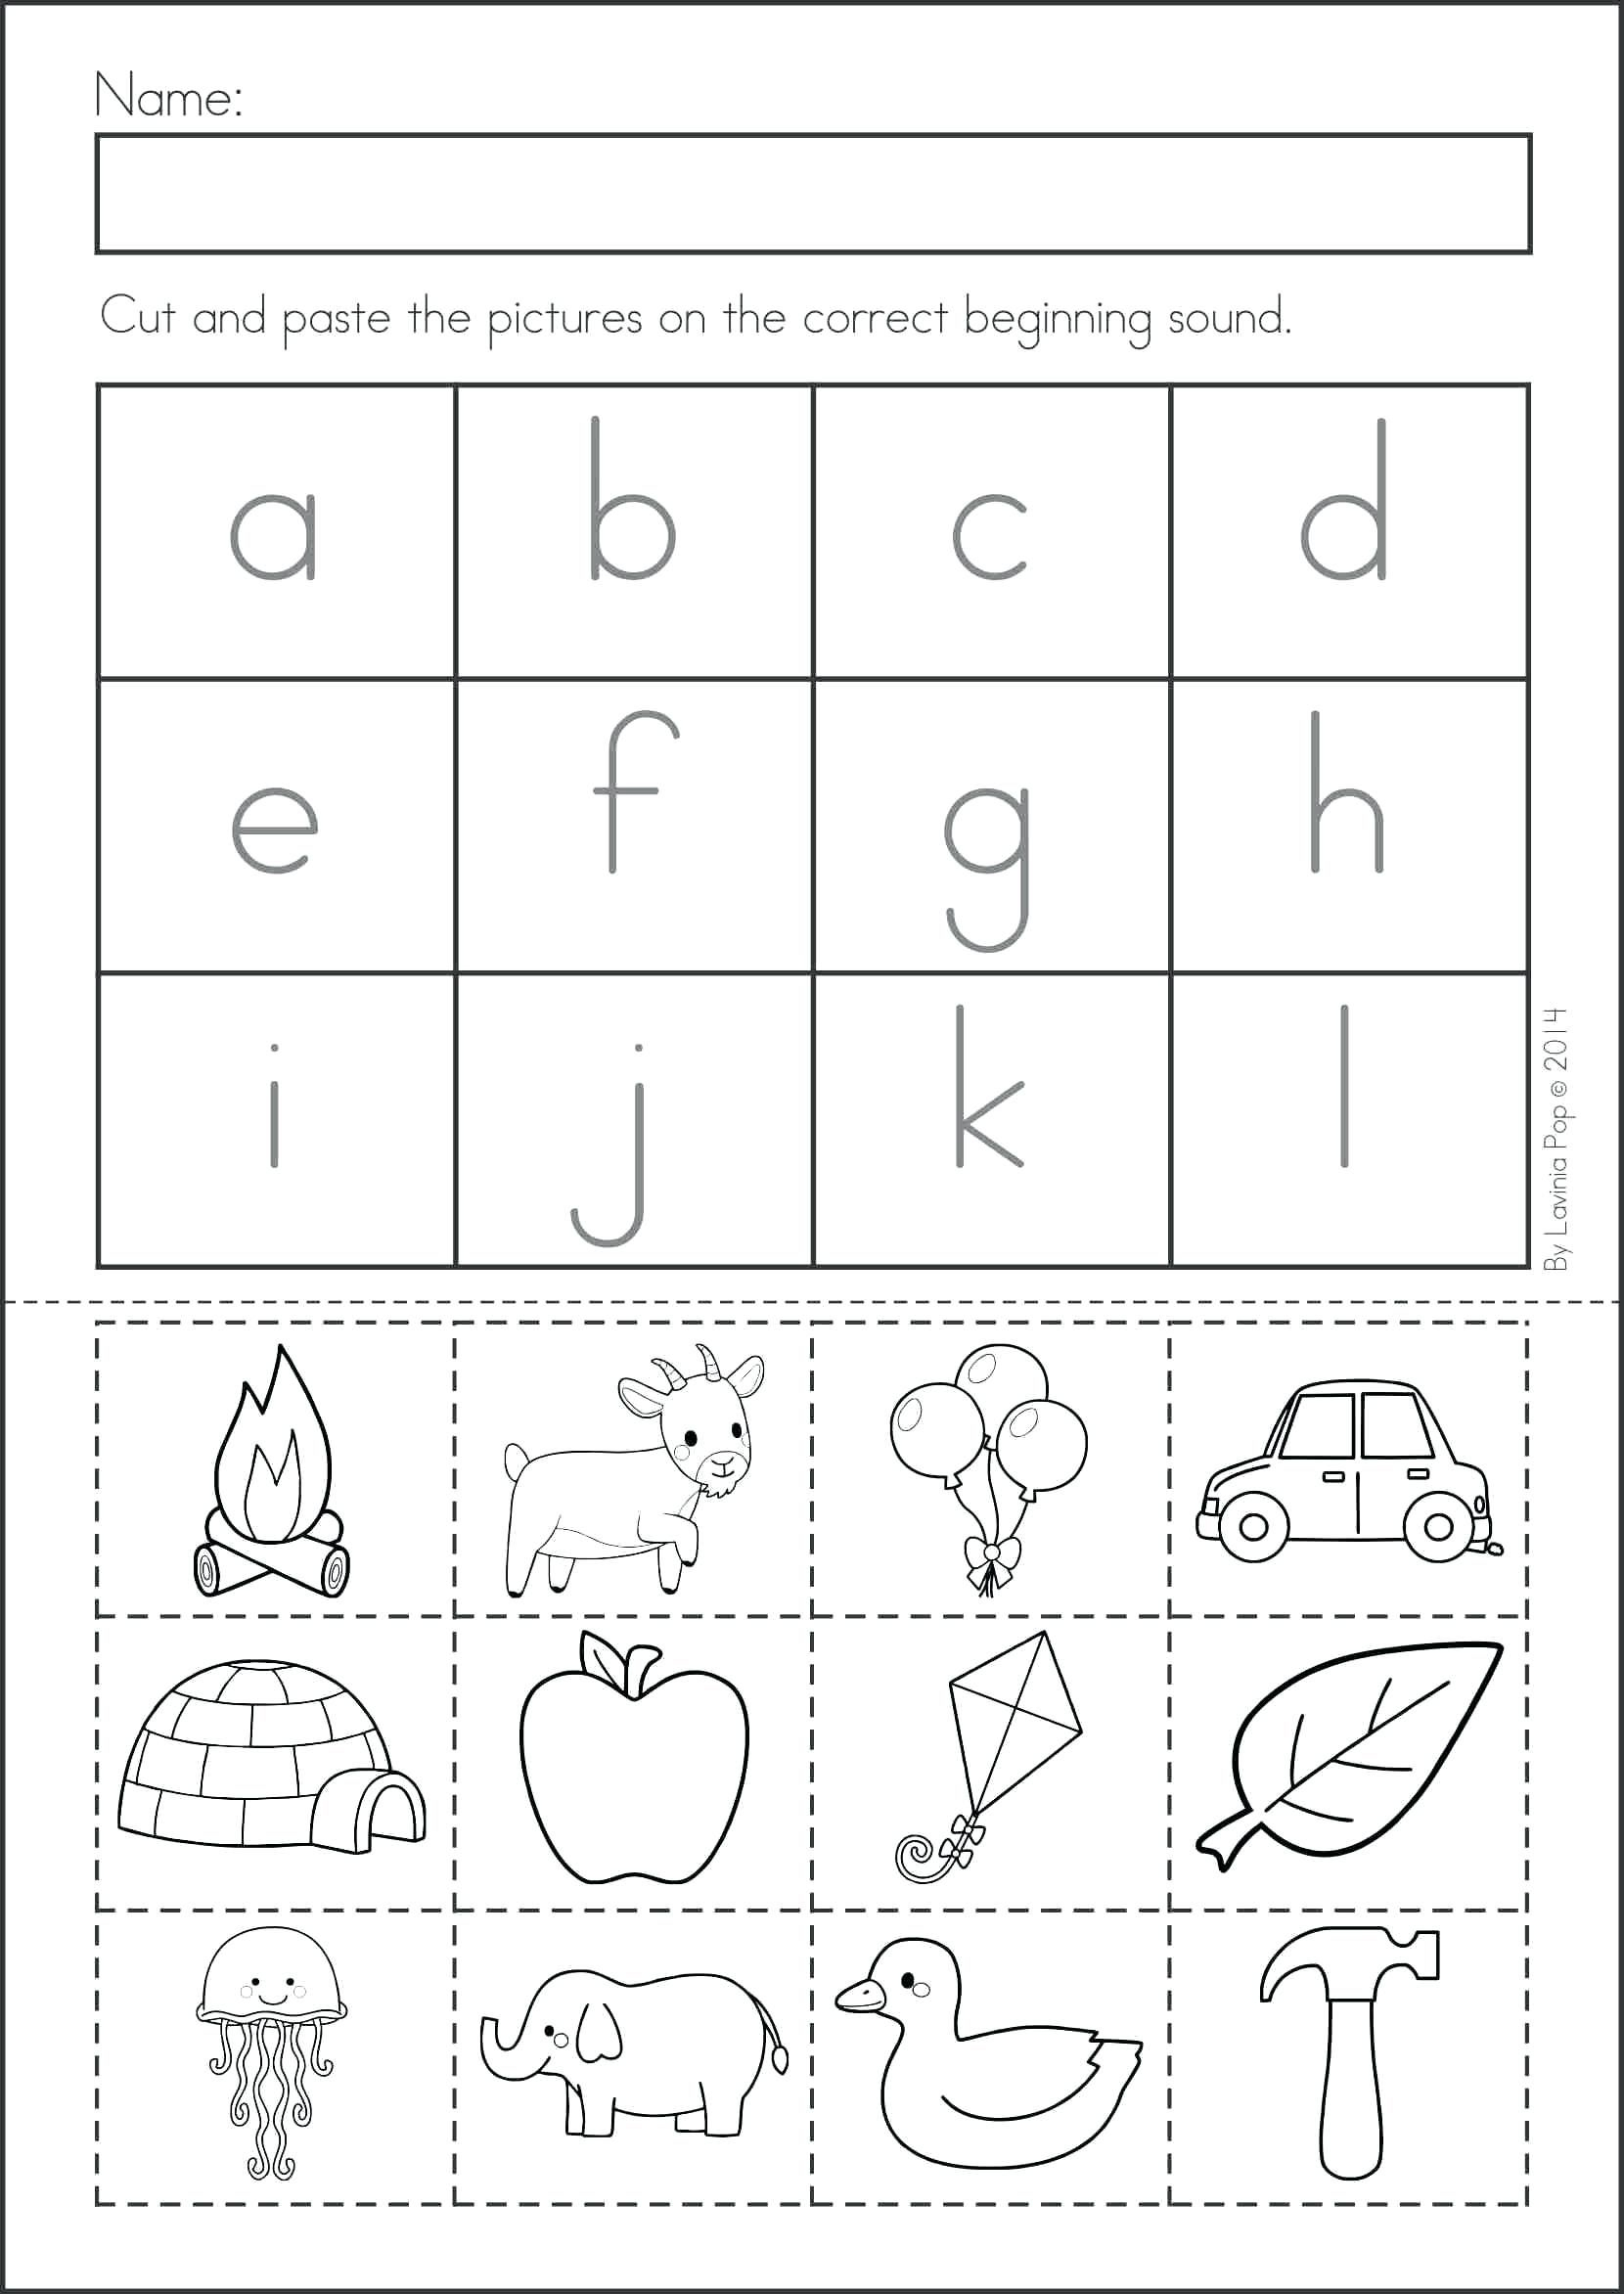 Kindergarten Kindergarten Cut And Paste Worksheets Switchconf - Free Printable Kindergarten Worksheets Cut And Paste